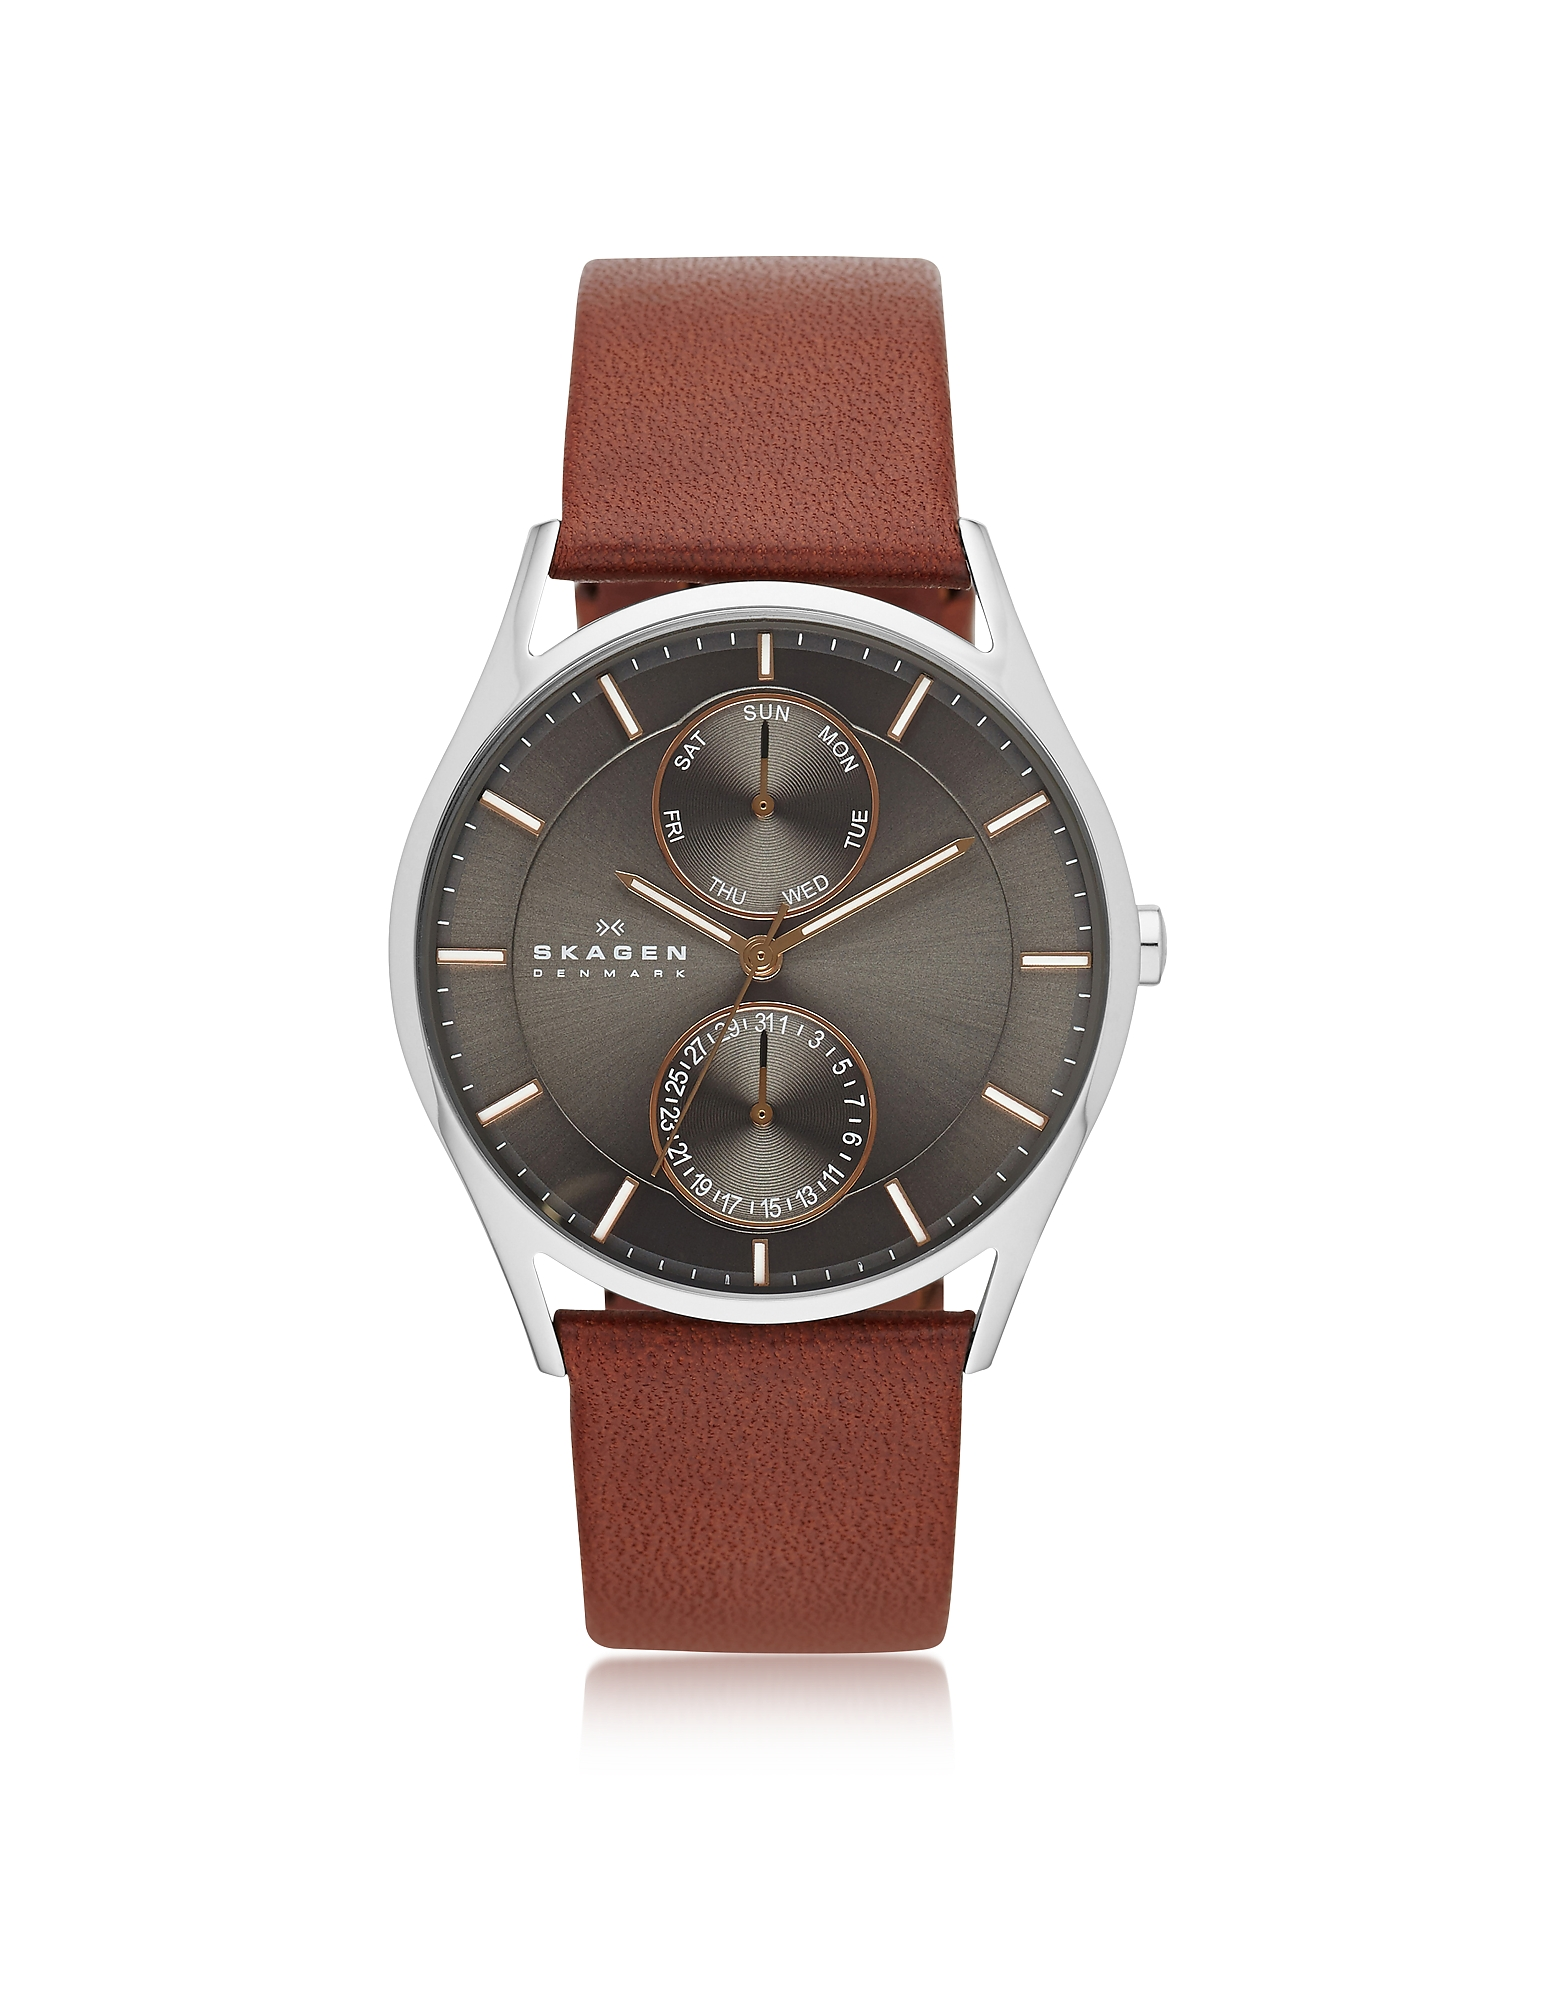 Skagen Men's Watches, Holst Multifunction Leather Men's Watch